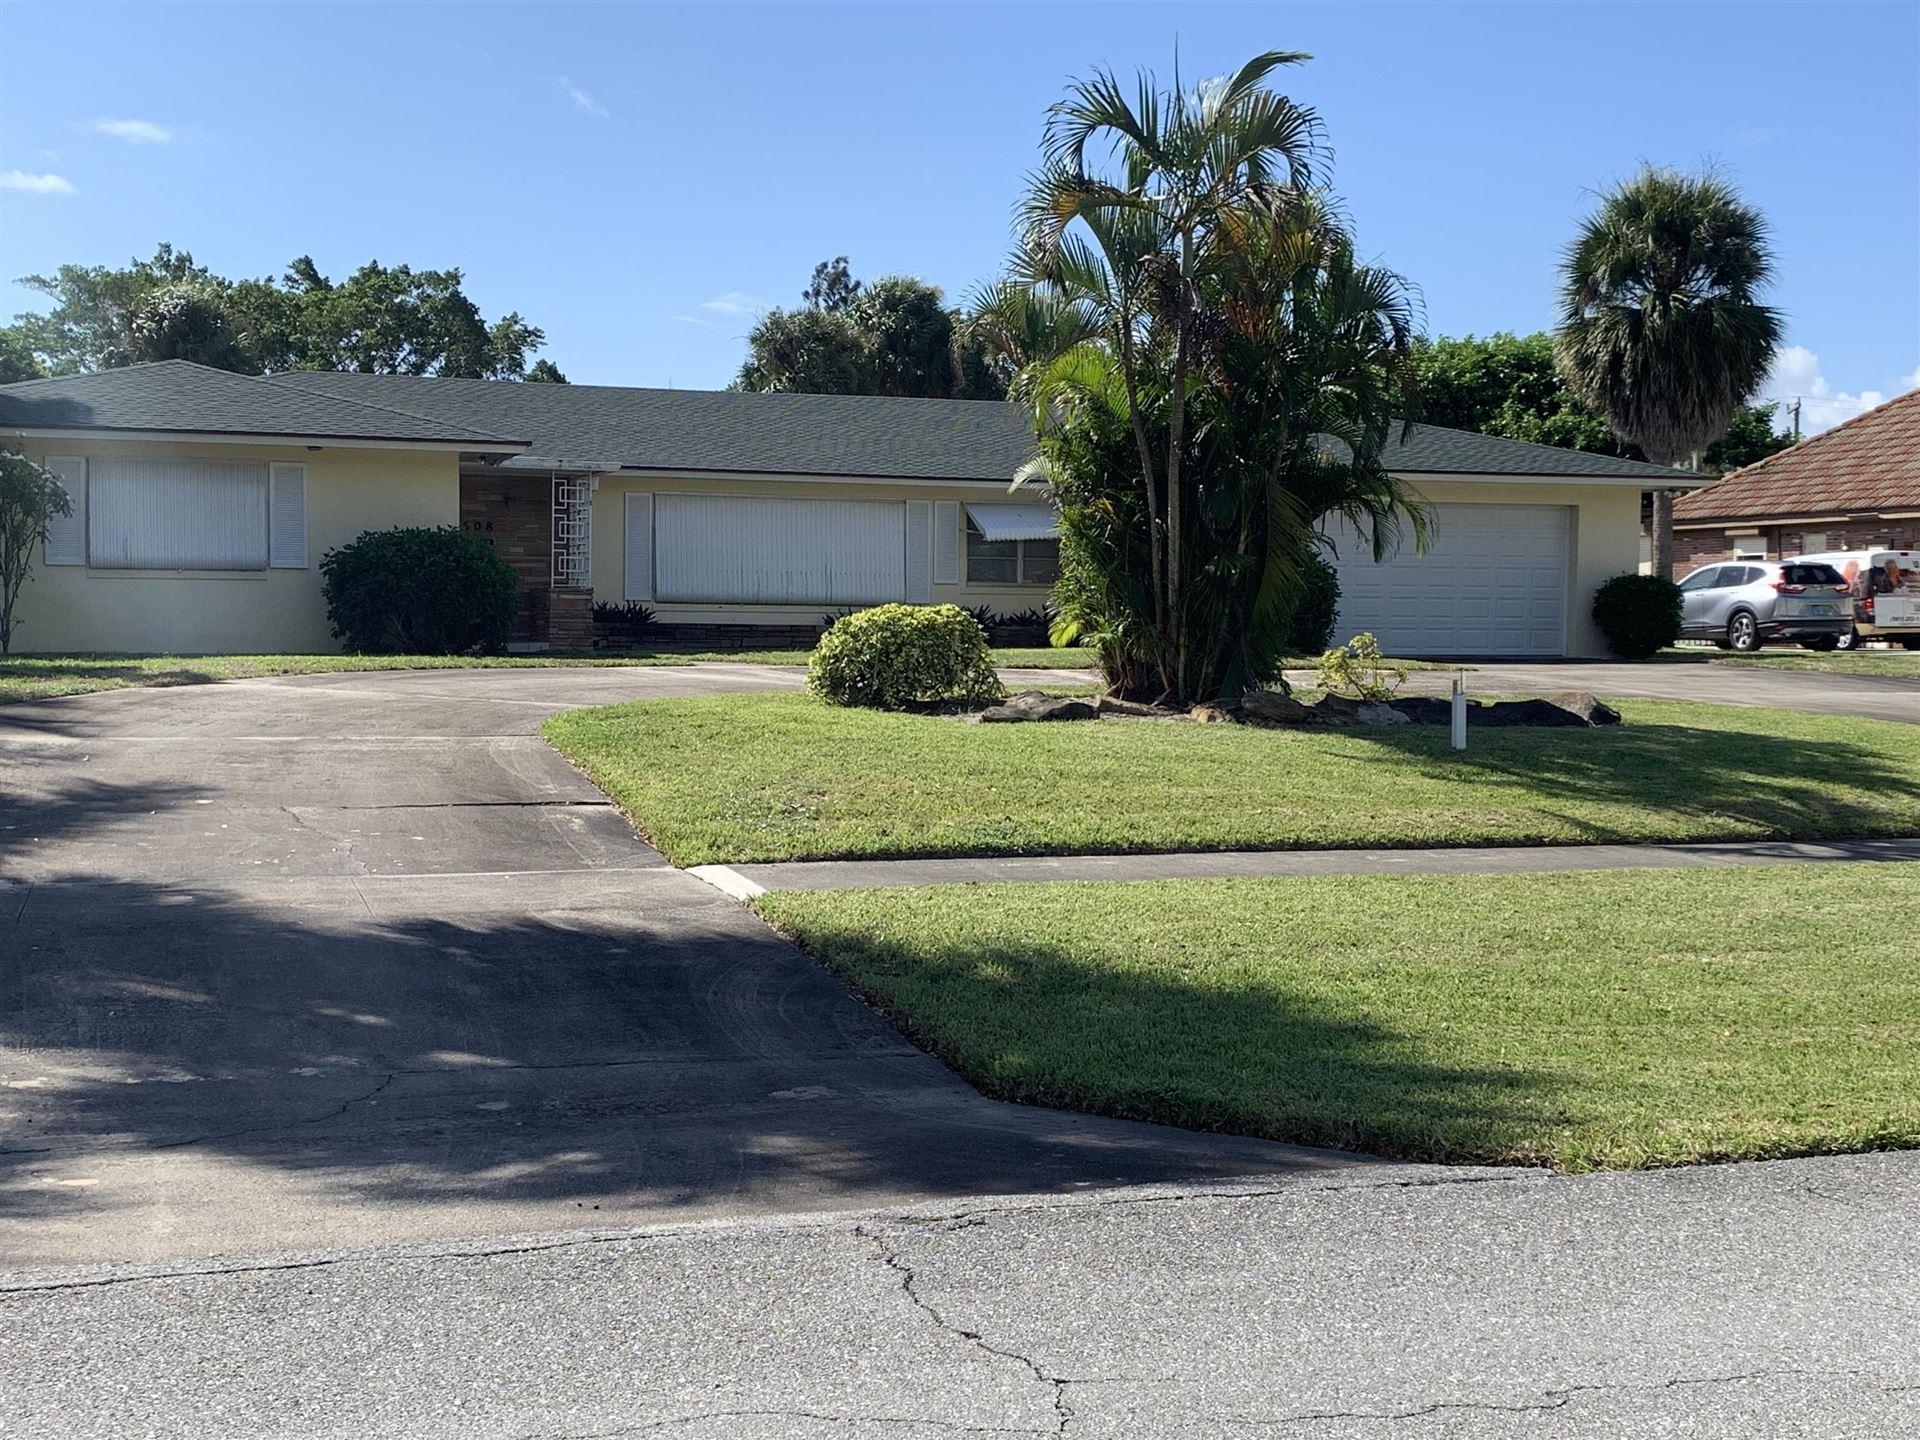 Photo of 508 Anchorage Drive, North Palm Beach, FL 33408 (MLS # RX-10751547)